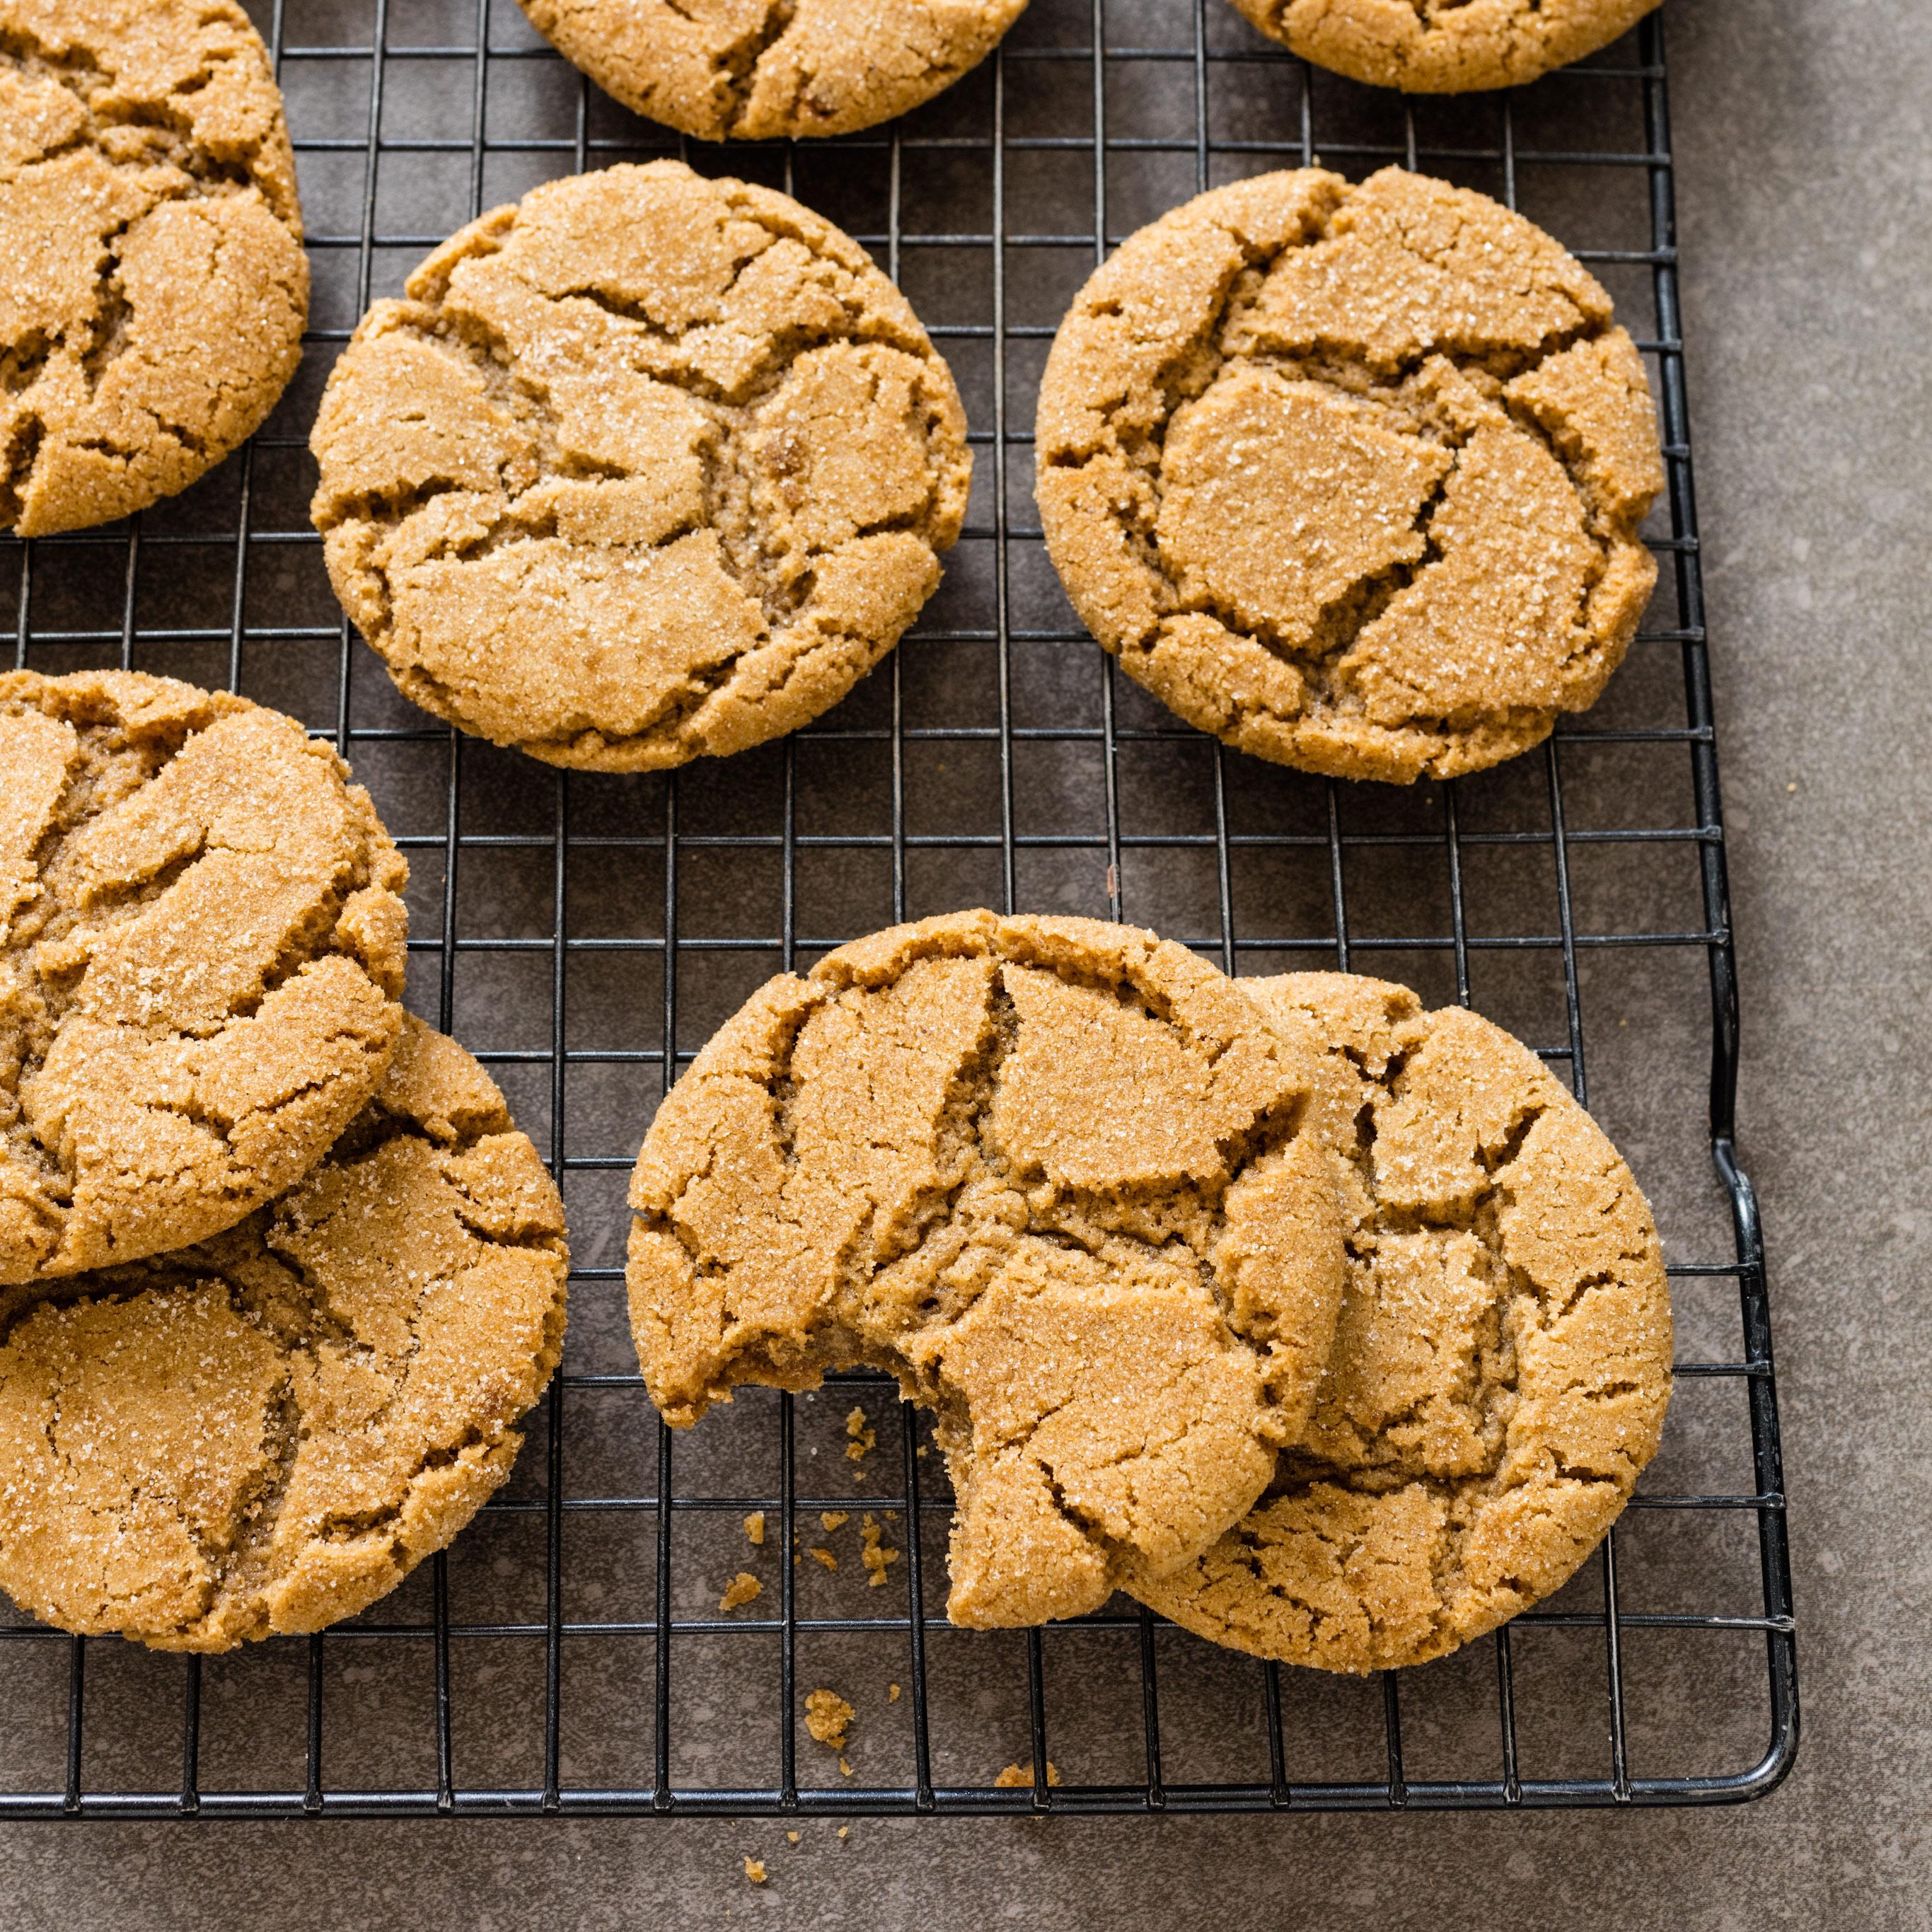 Brown Sugar Cookies | Cook's Illustrated